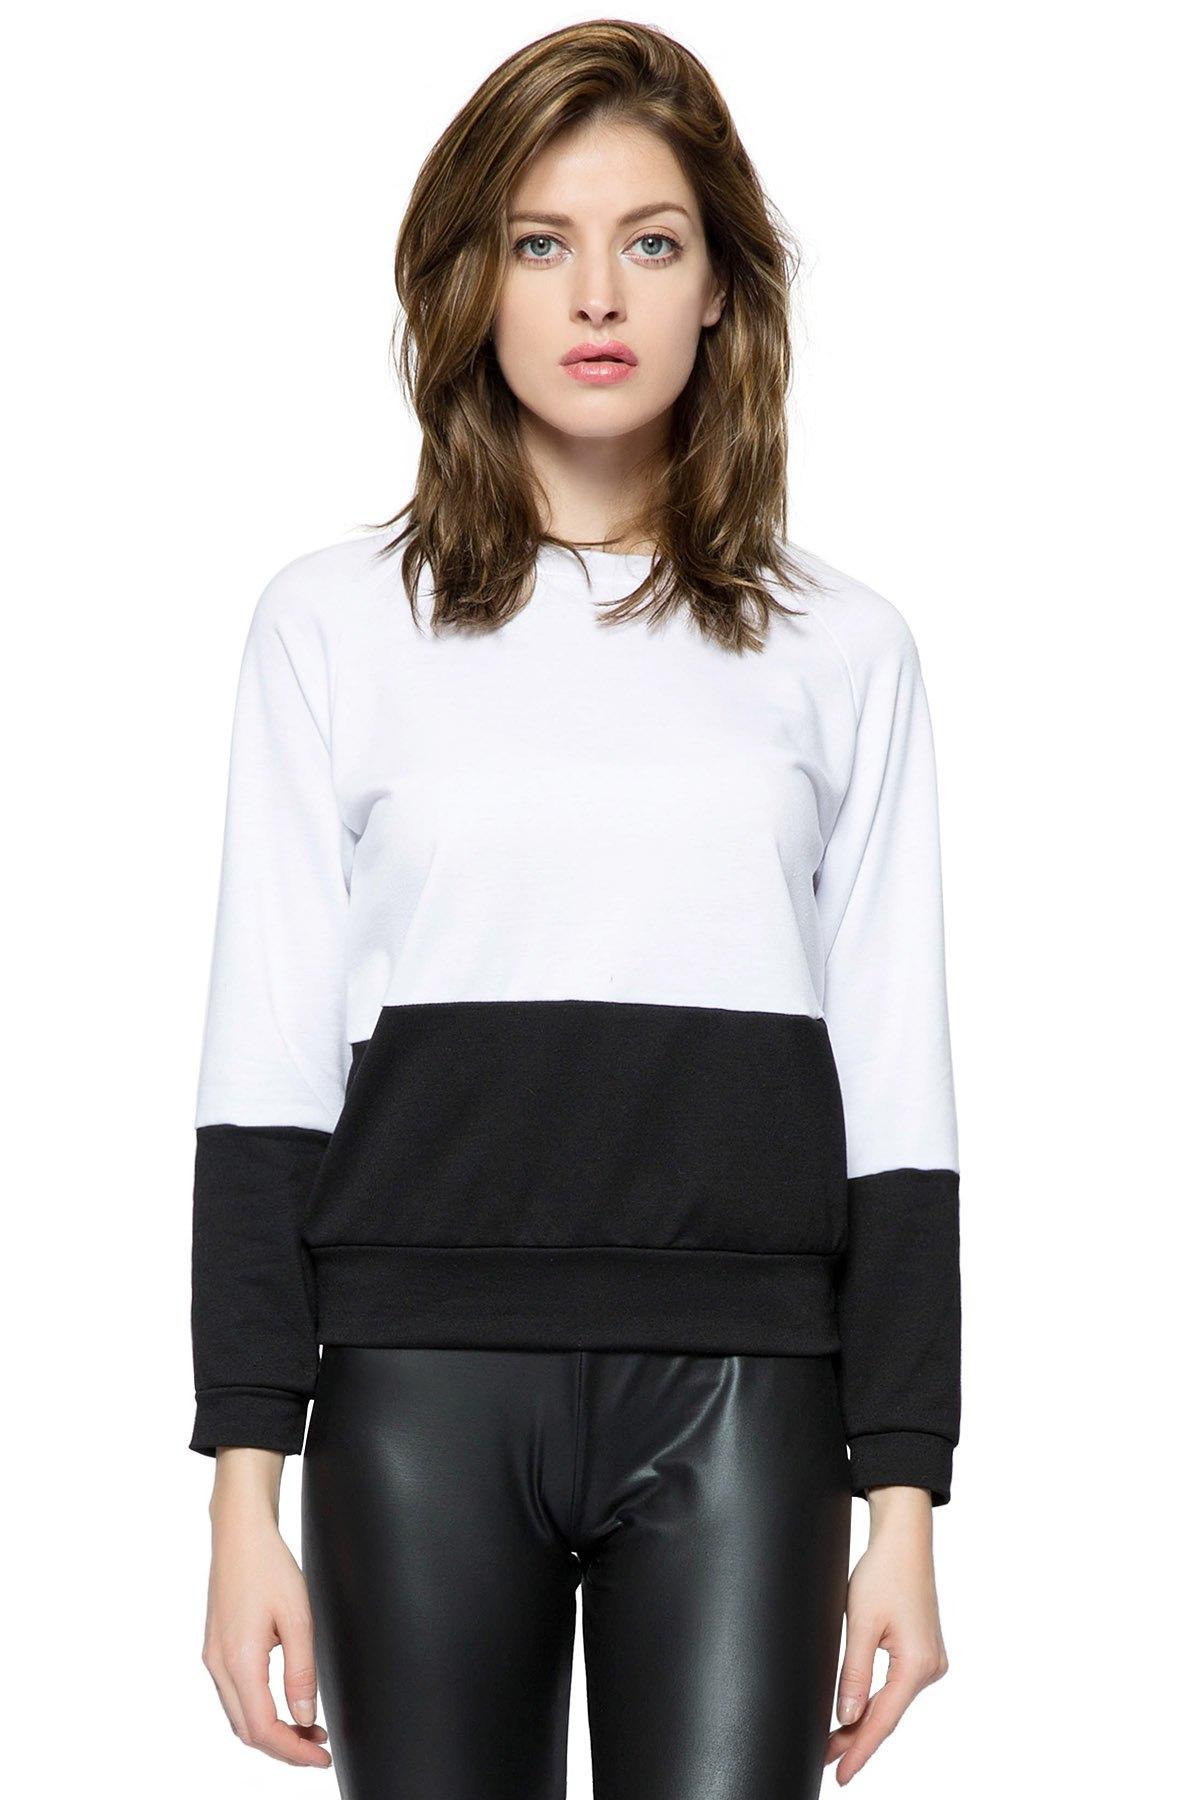 Long Sleeves Color Block Sweatshirt - WHITE/BLACK XS